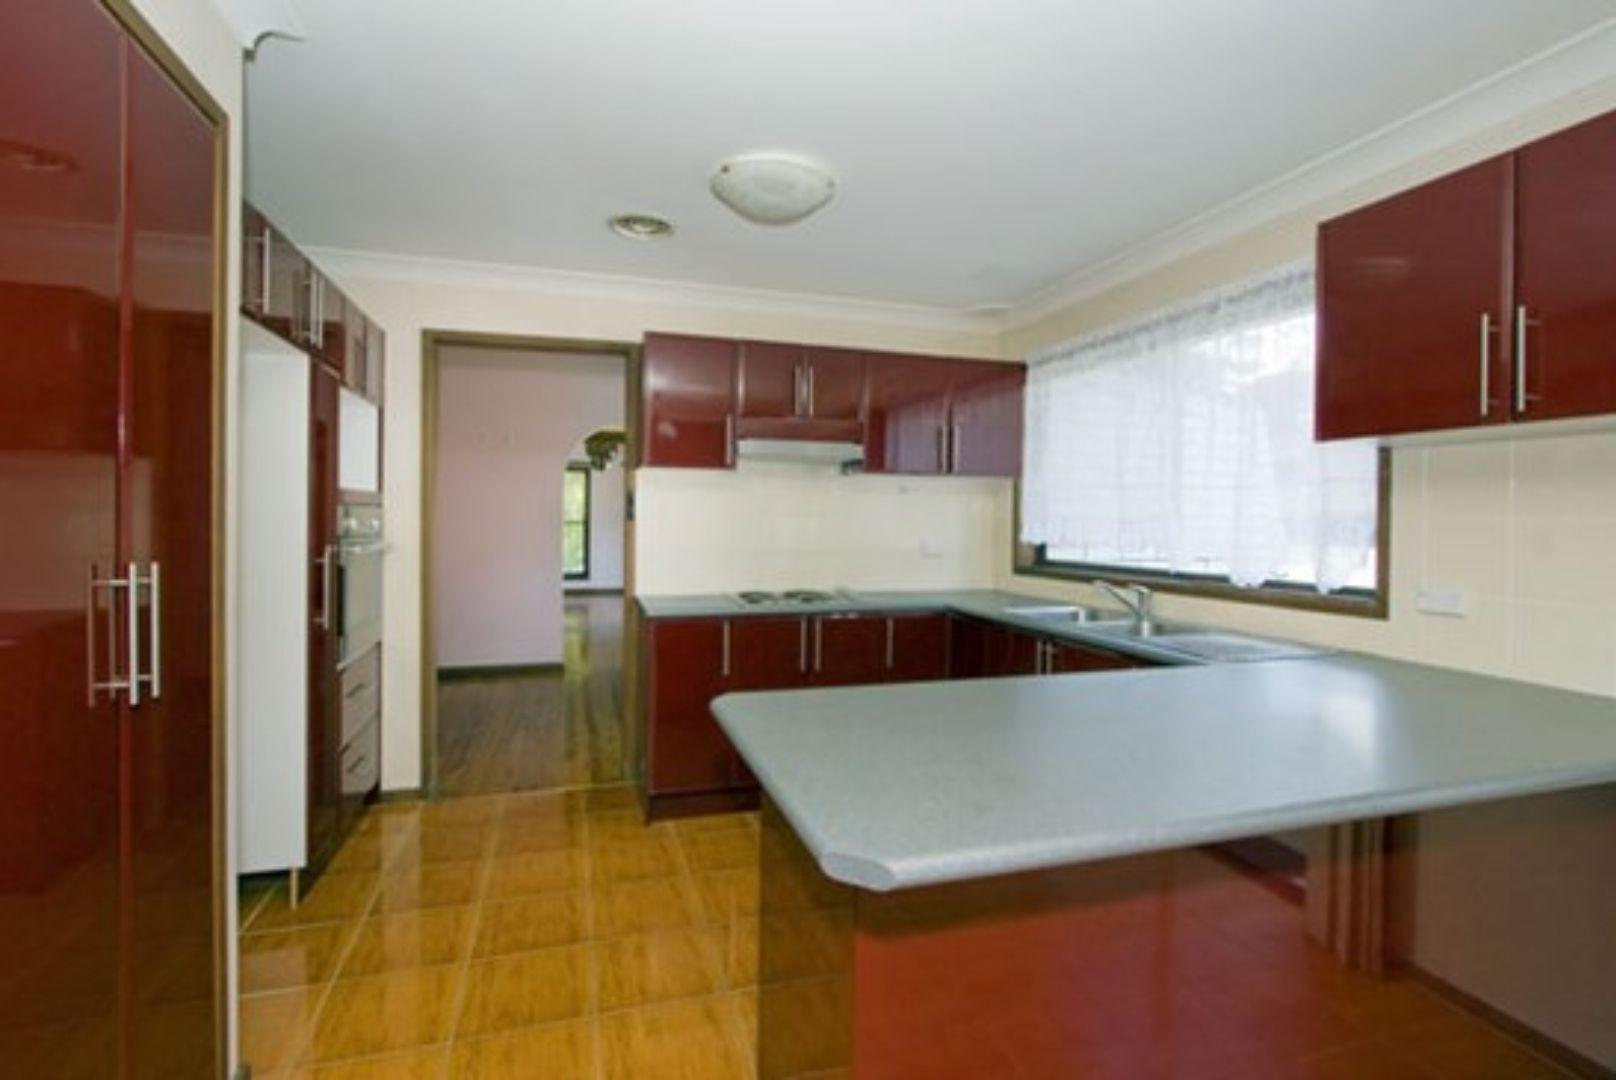 225 Madagascar Drive, Kings Park NSW 2148, Image 2